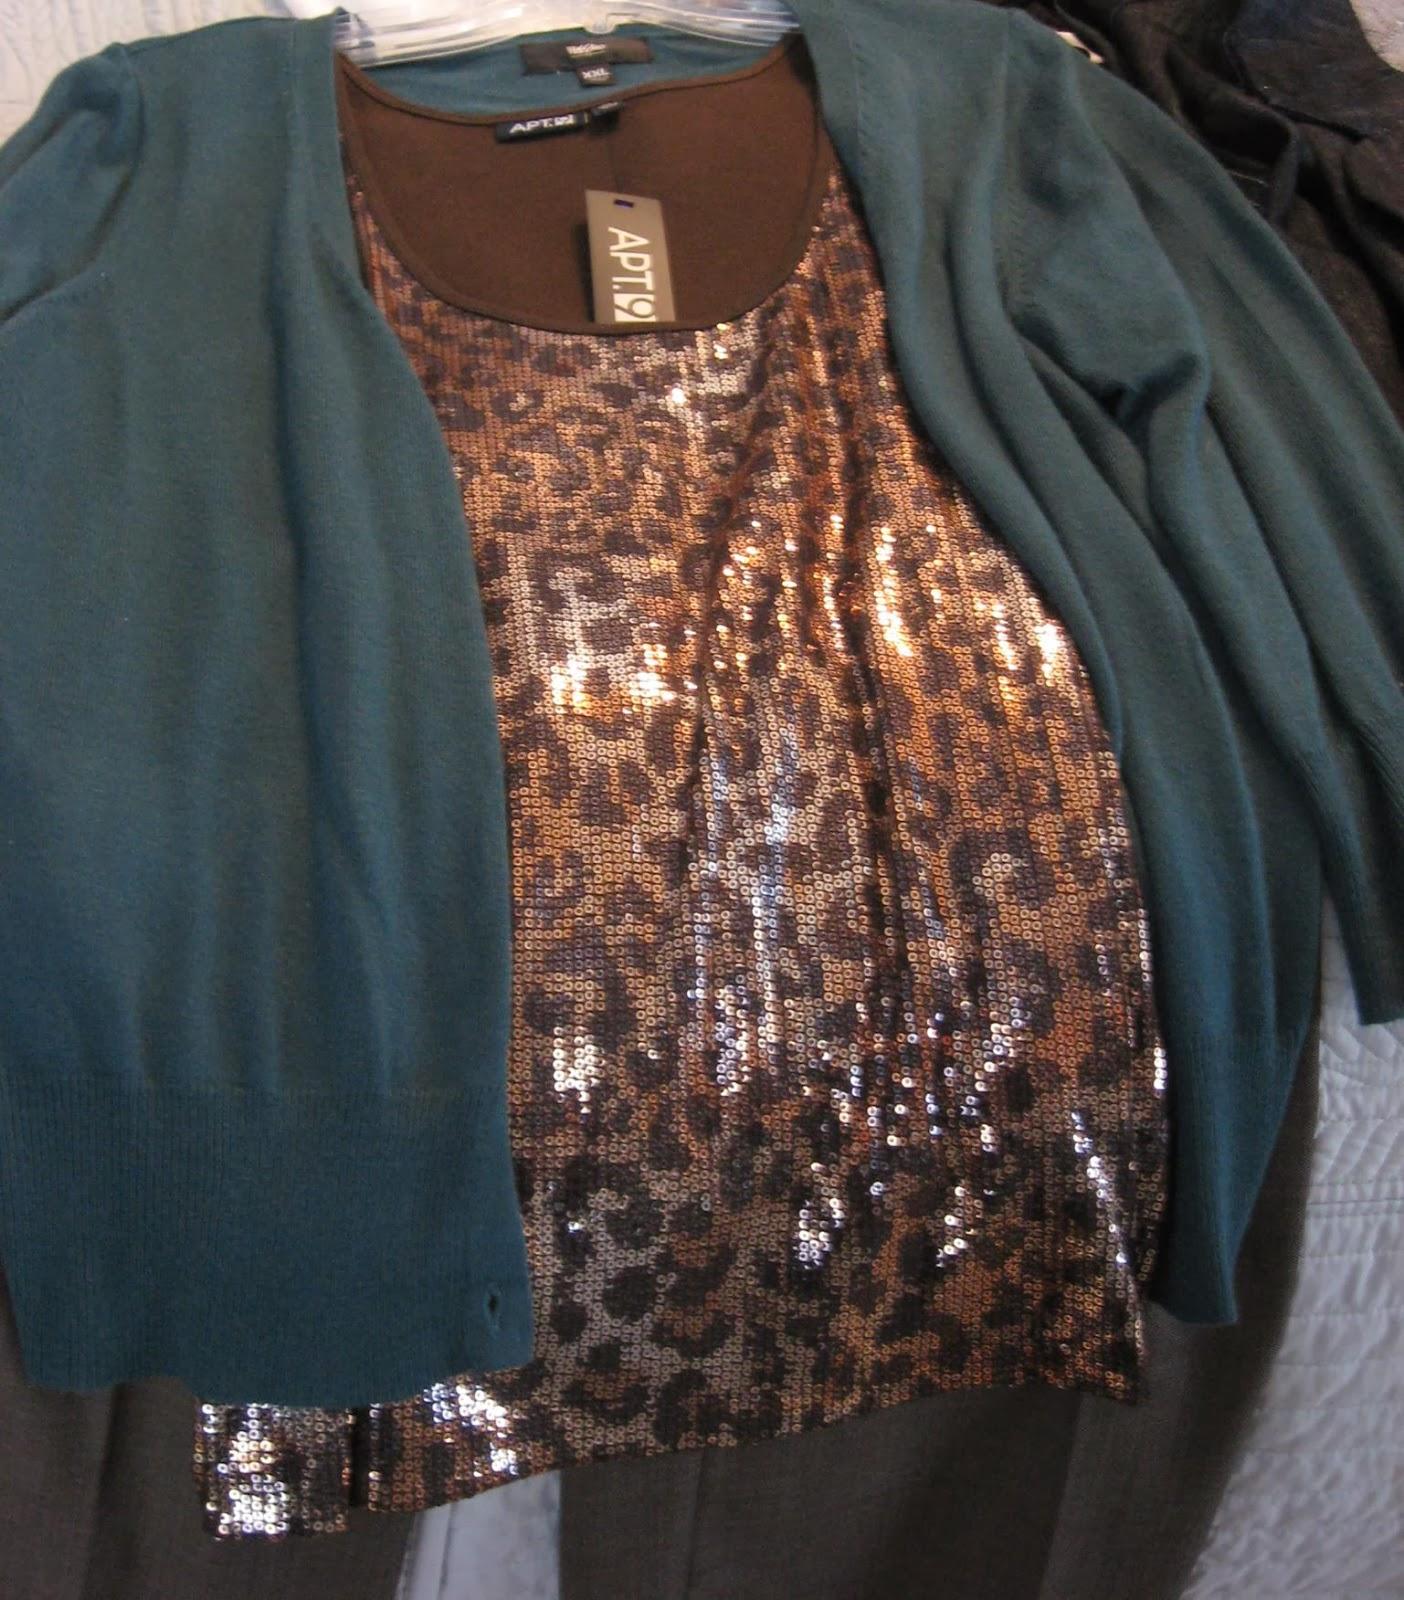 closest shopping, closet edit, wardrobe edit, business casual, cardigan, teal